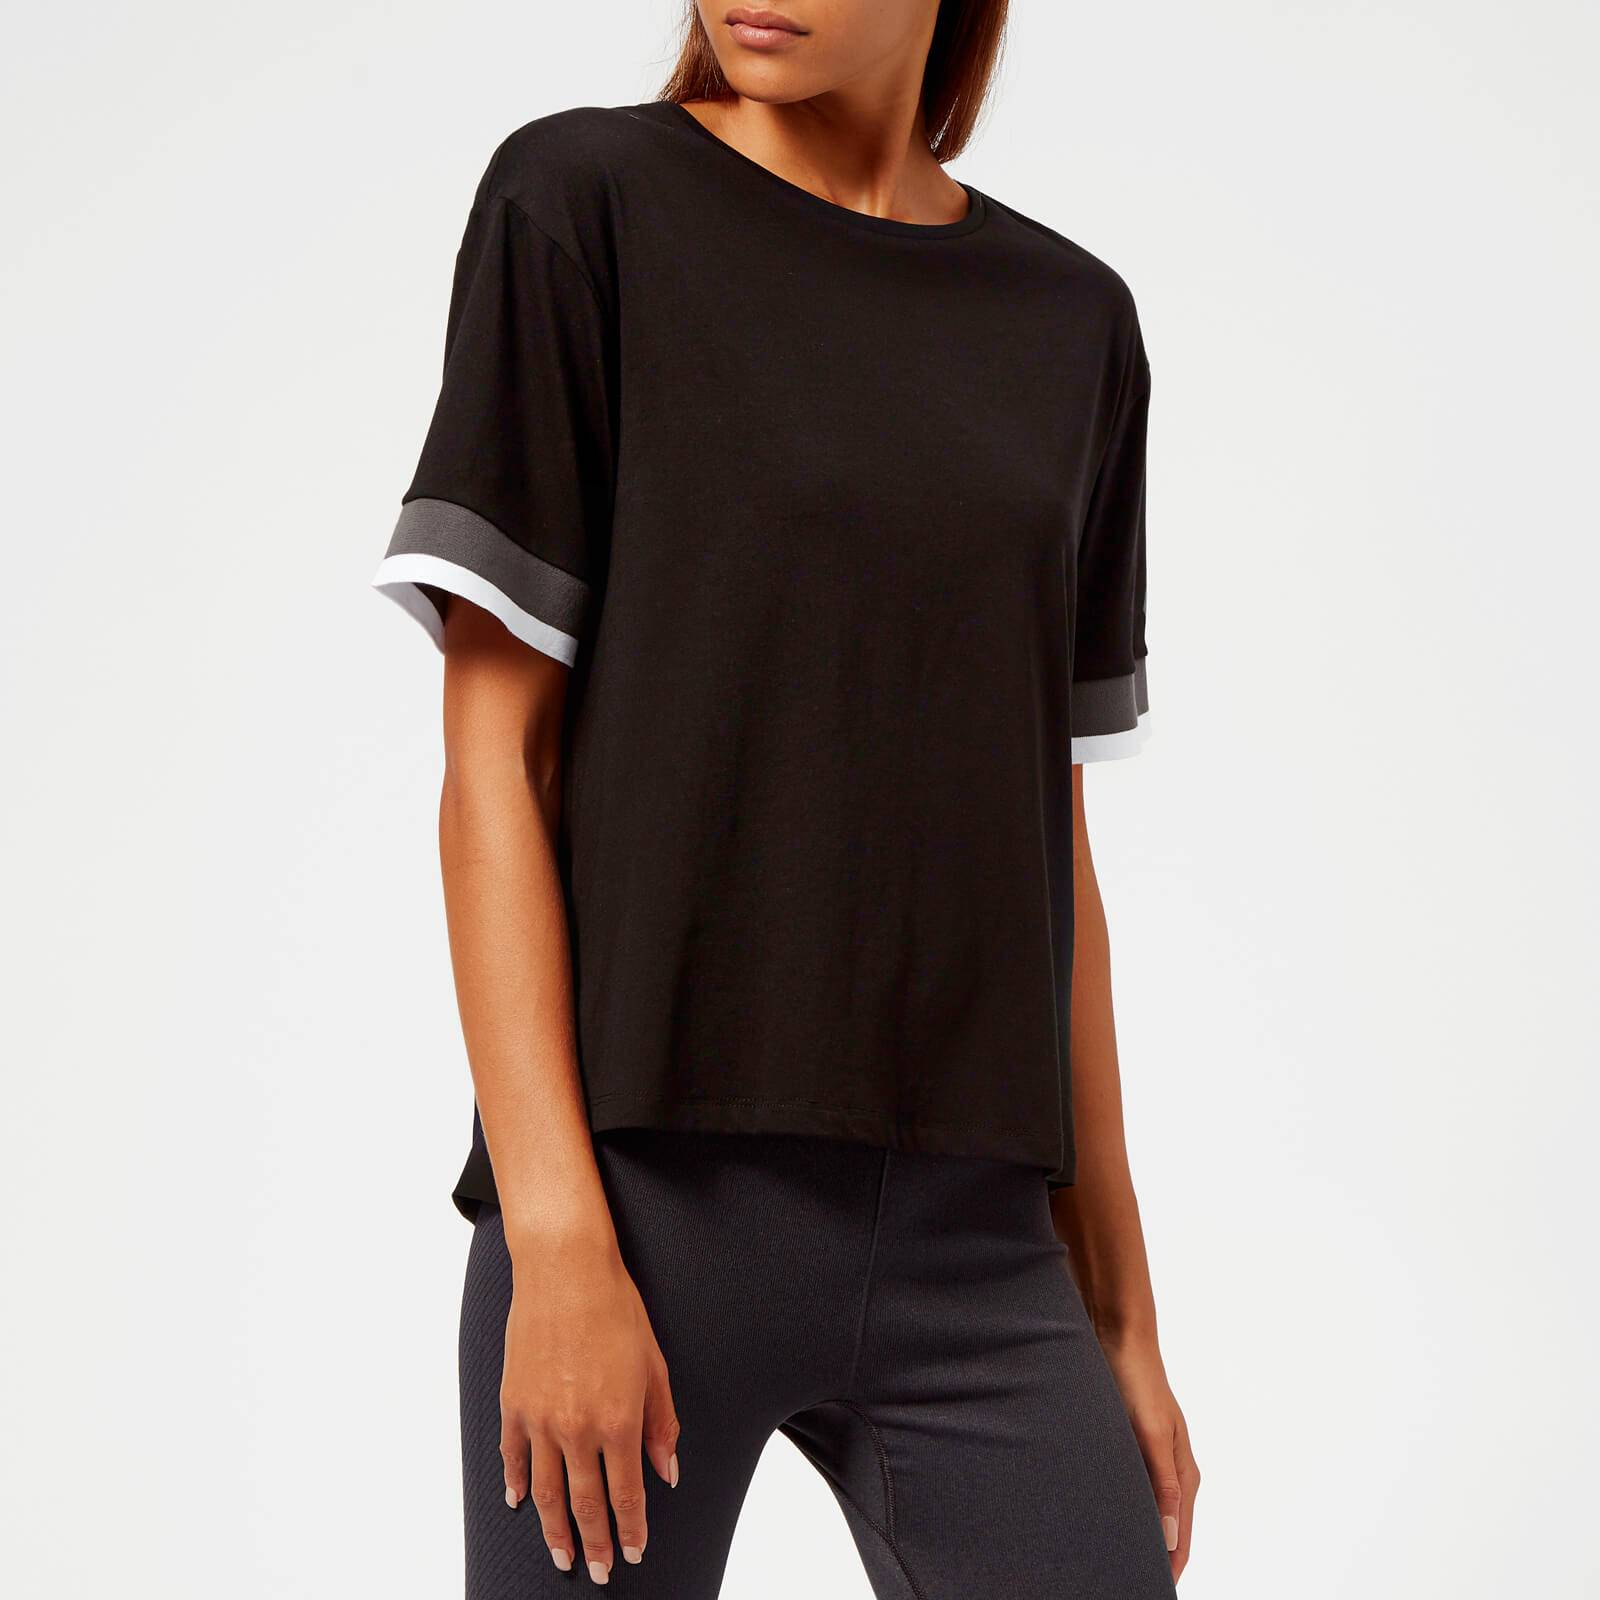 Asics Women's Mix Fabric Short Sleeve Top - Performance Black - S - Black